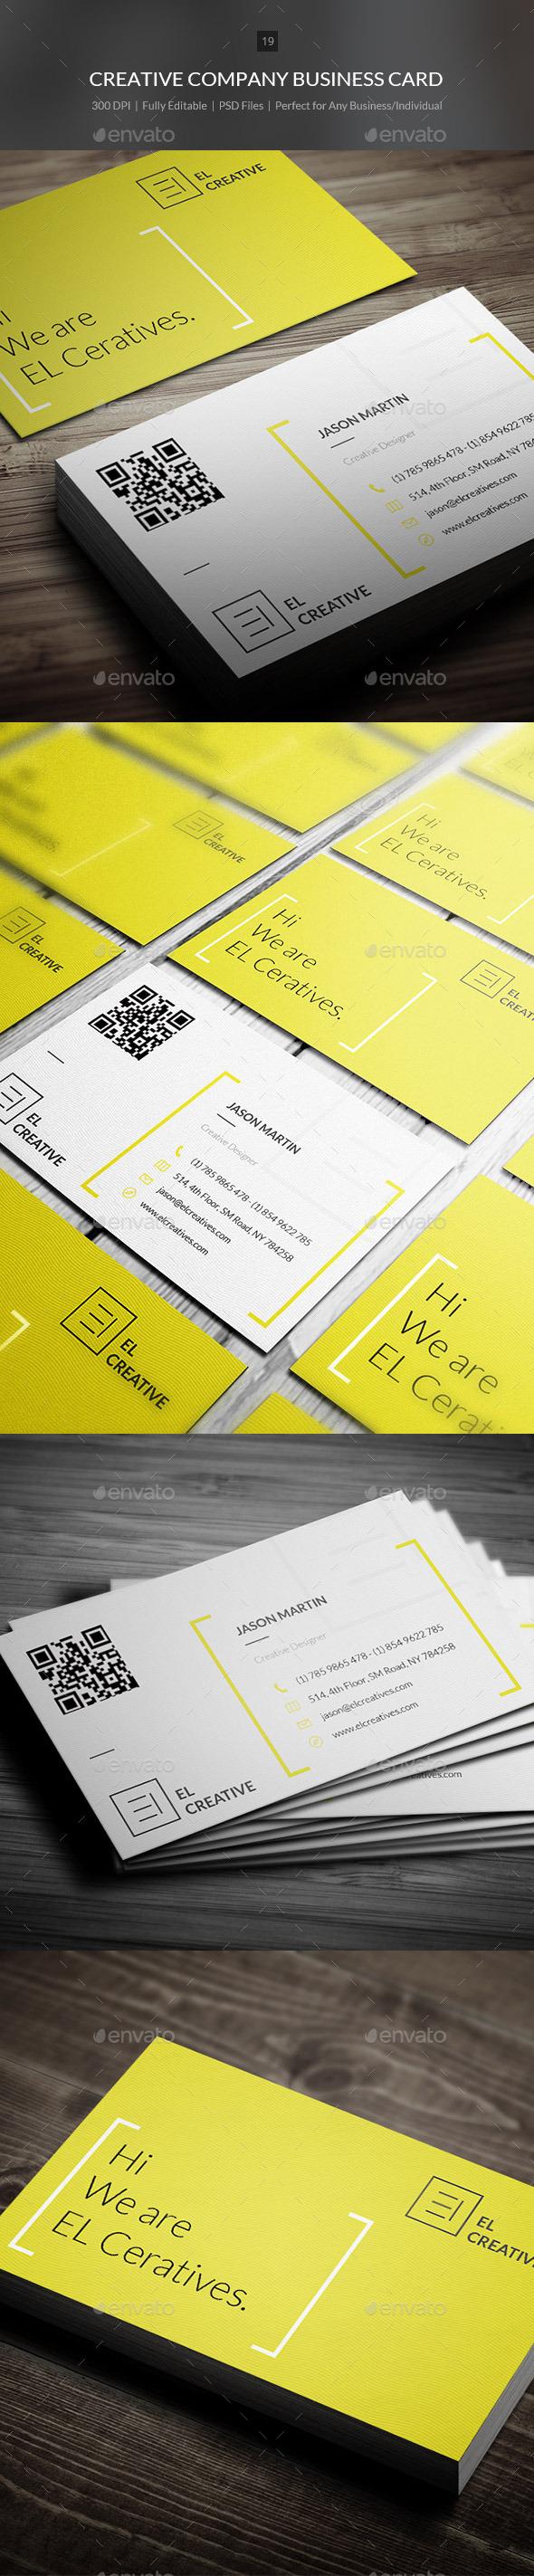 GraphicRiver Creative Company Business Card 19 10185390